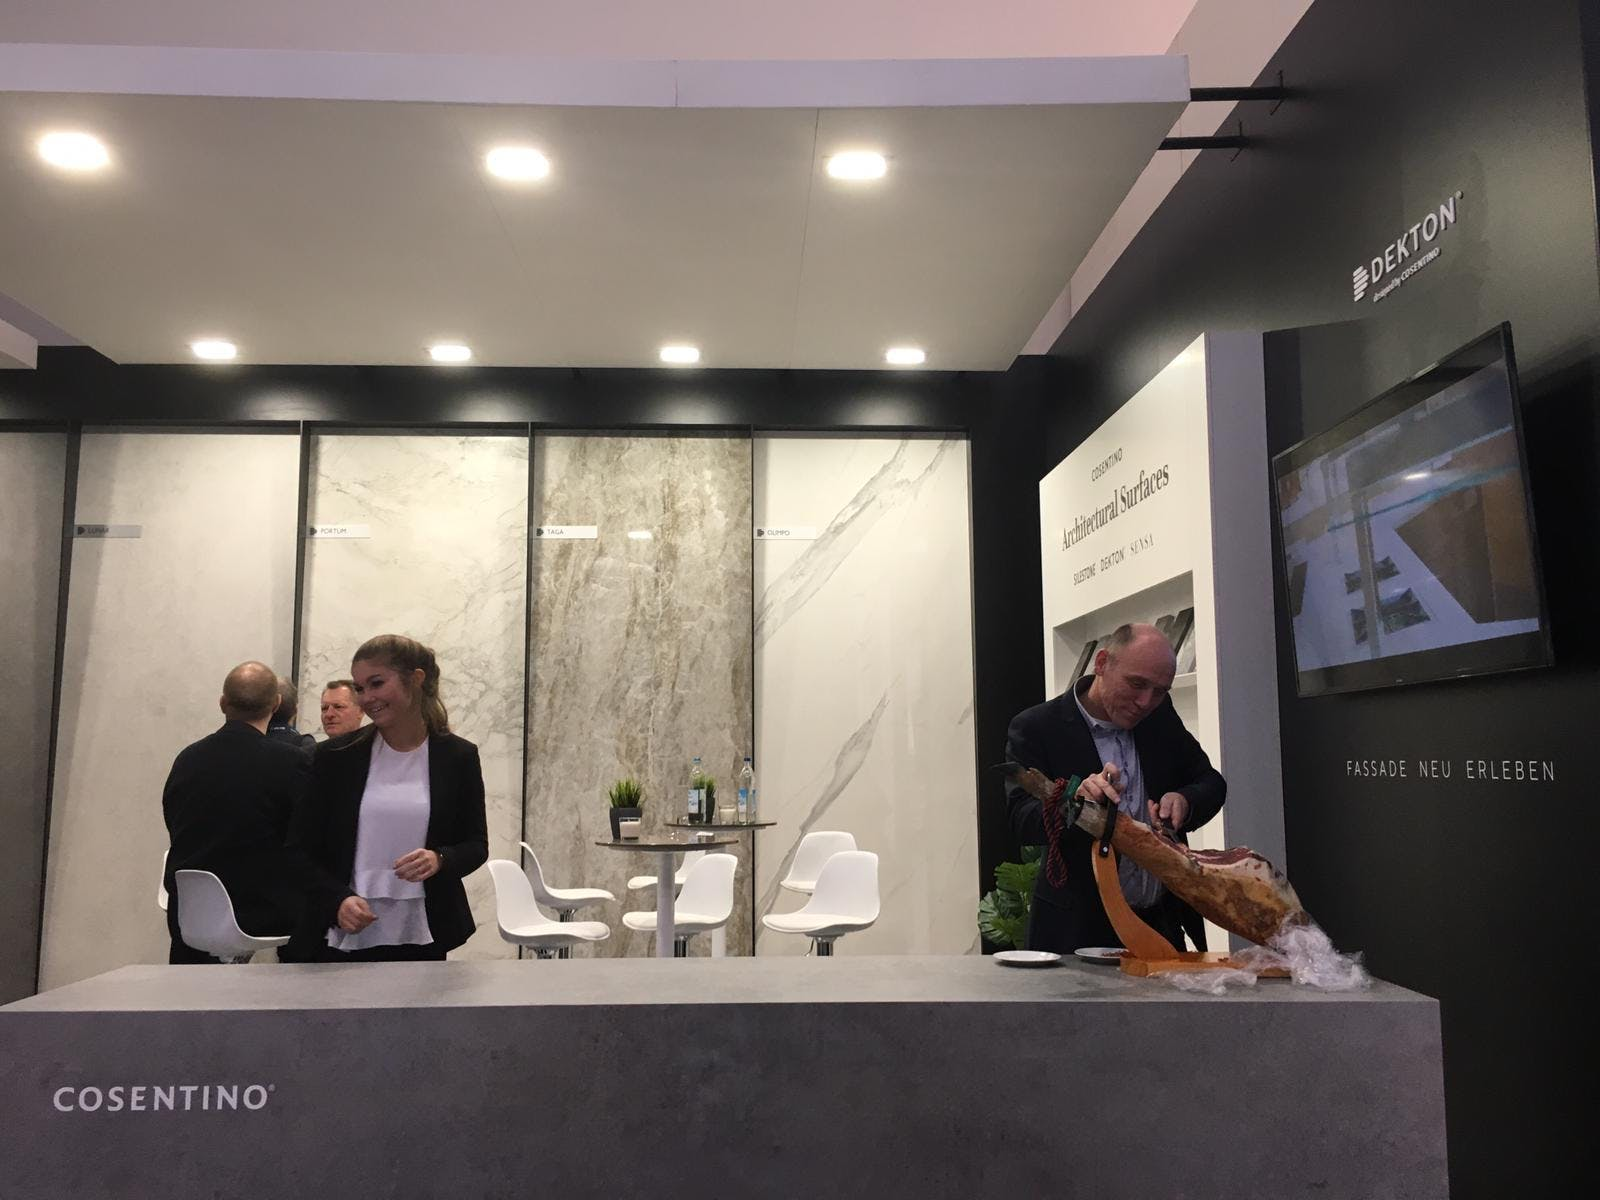 Image of Cosentino stand BAU 2019 1 in Cosentino presents its novelties at BAU 2019 - Cosentino